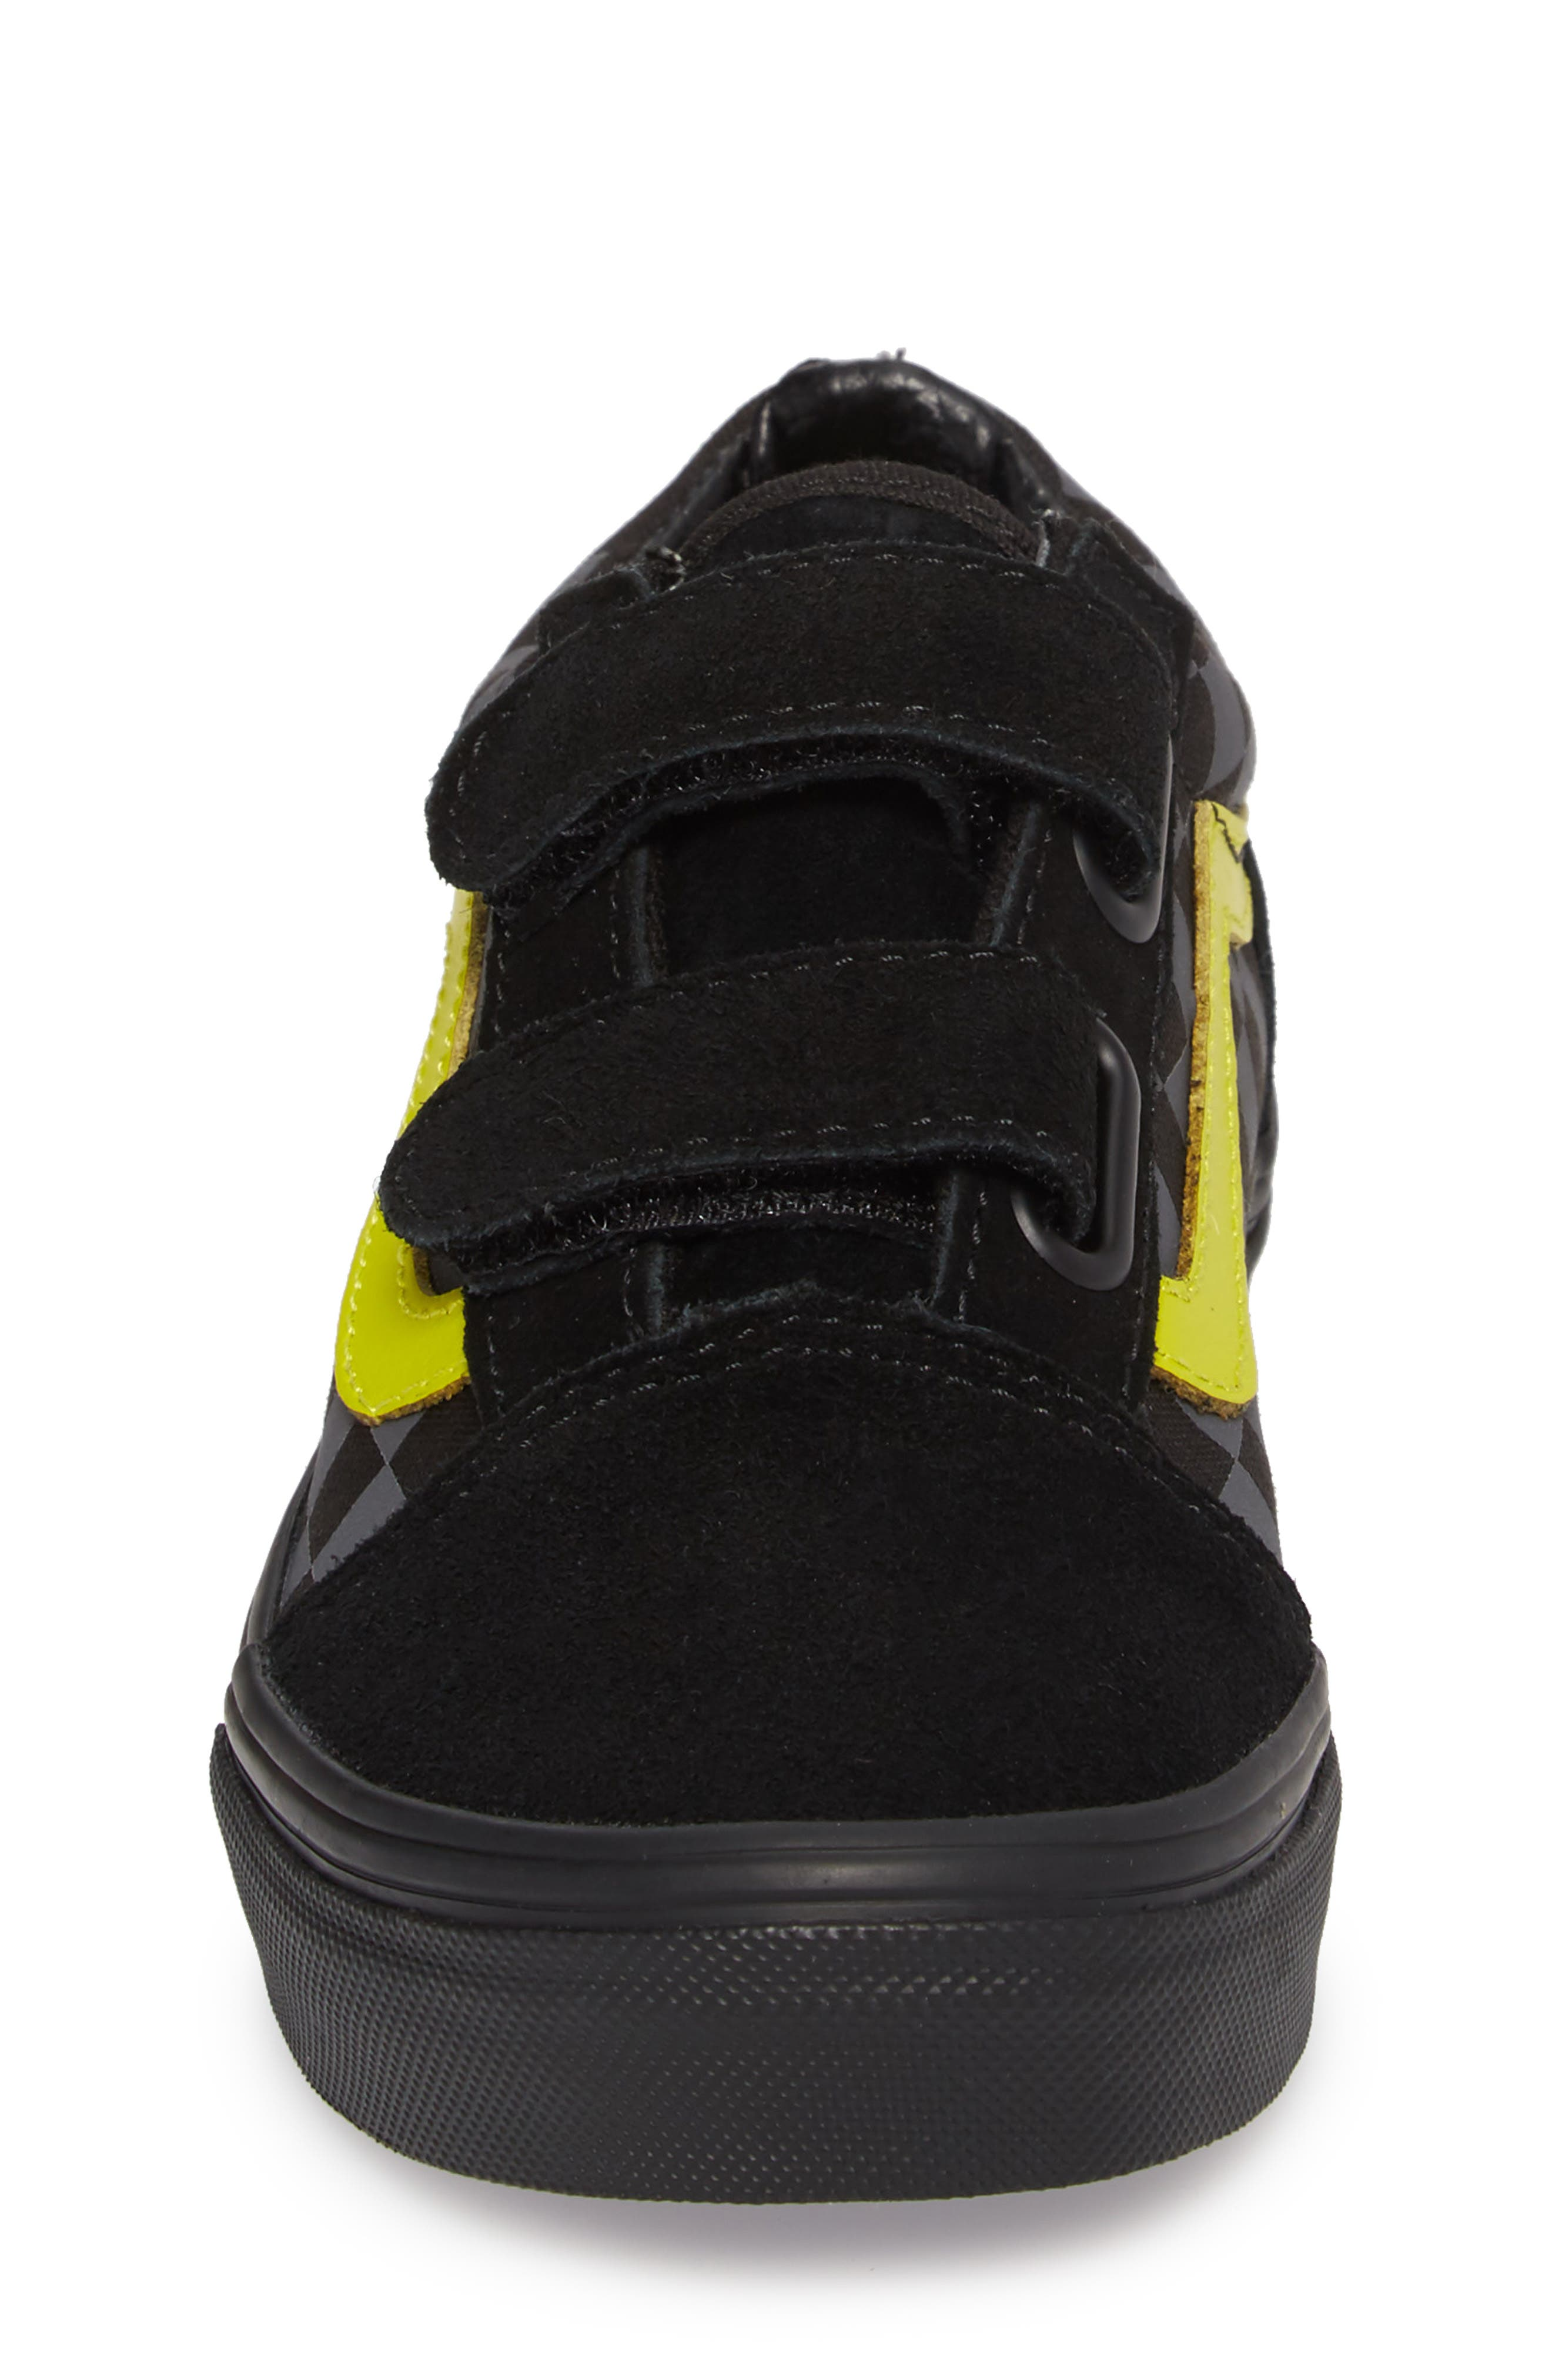 Alternate Image 4  - Vans Reflective Checkerboard Old Skool V Sneaker (Baby, Walker, Toddler, Little Kid & Big Kid)